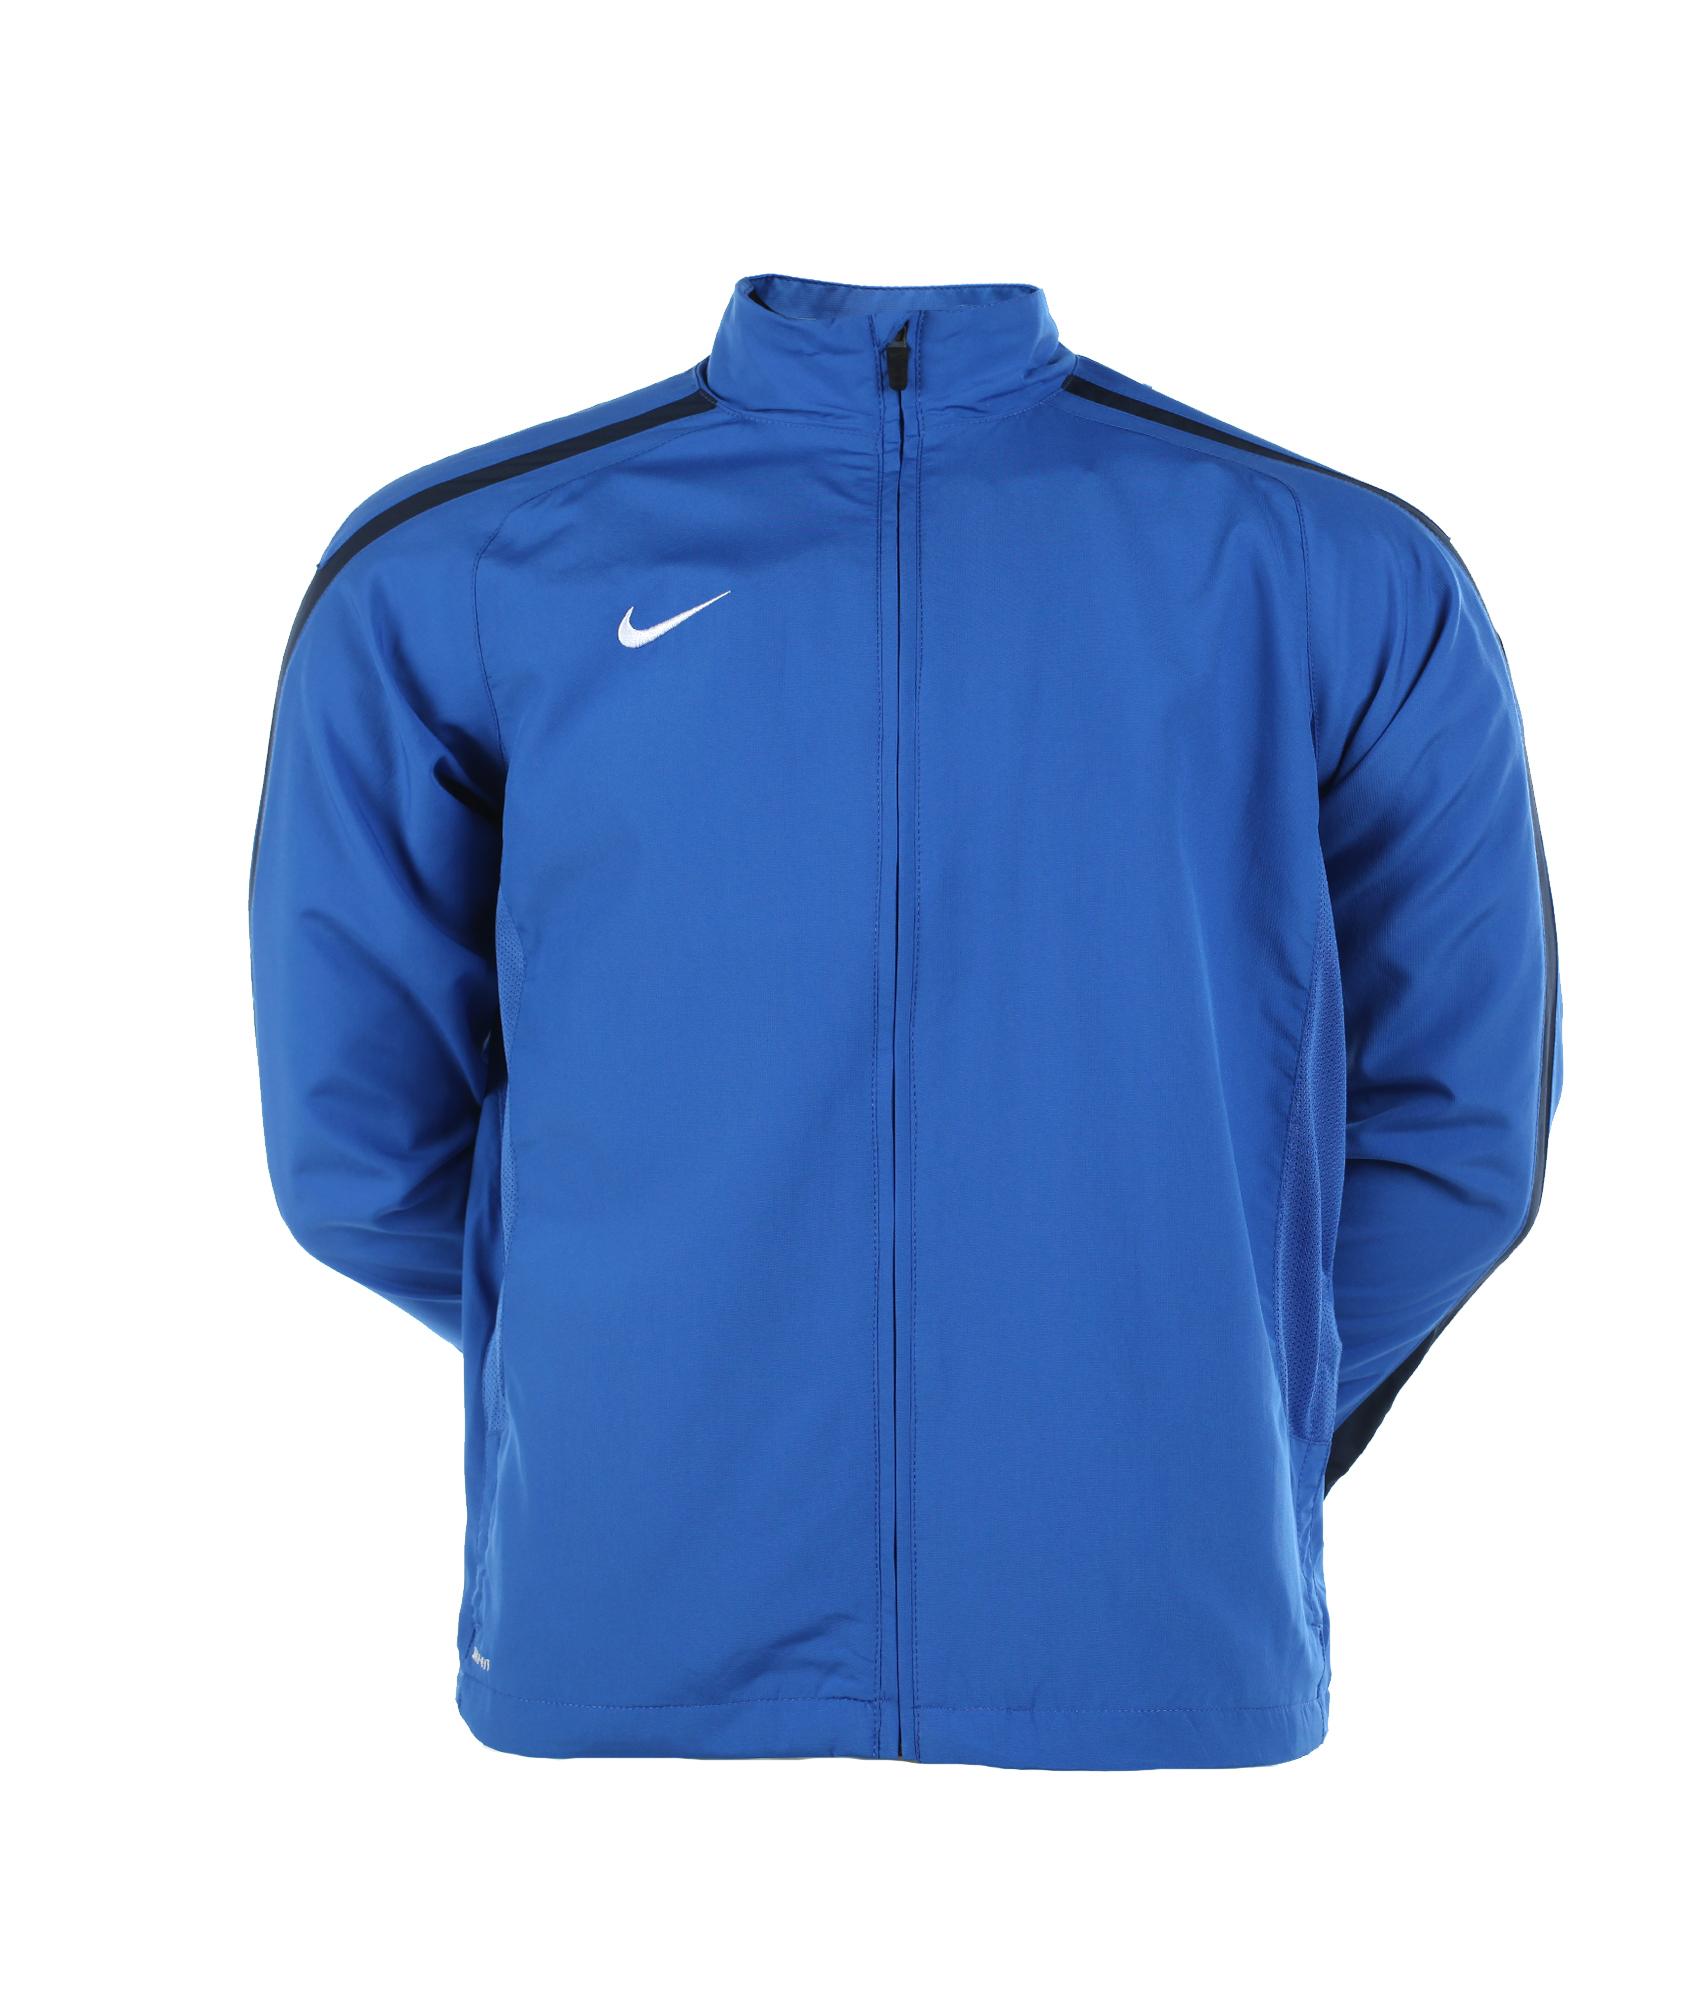 Куртка Nike BOYS COMP 11, Цвет-Синий, Размер-S